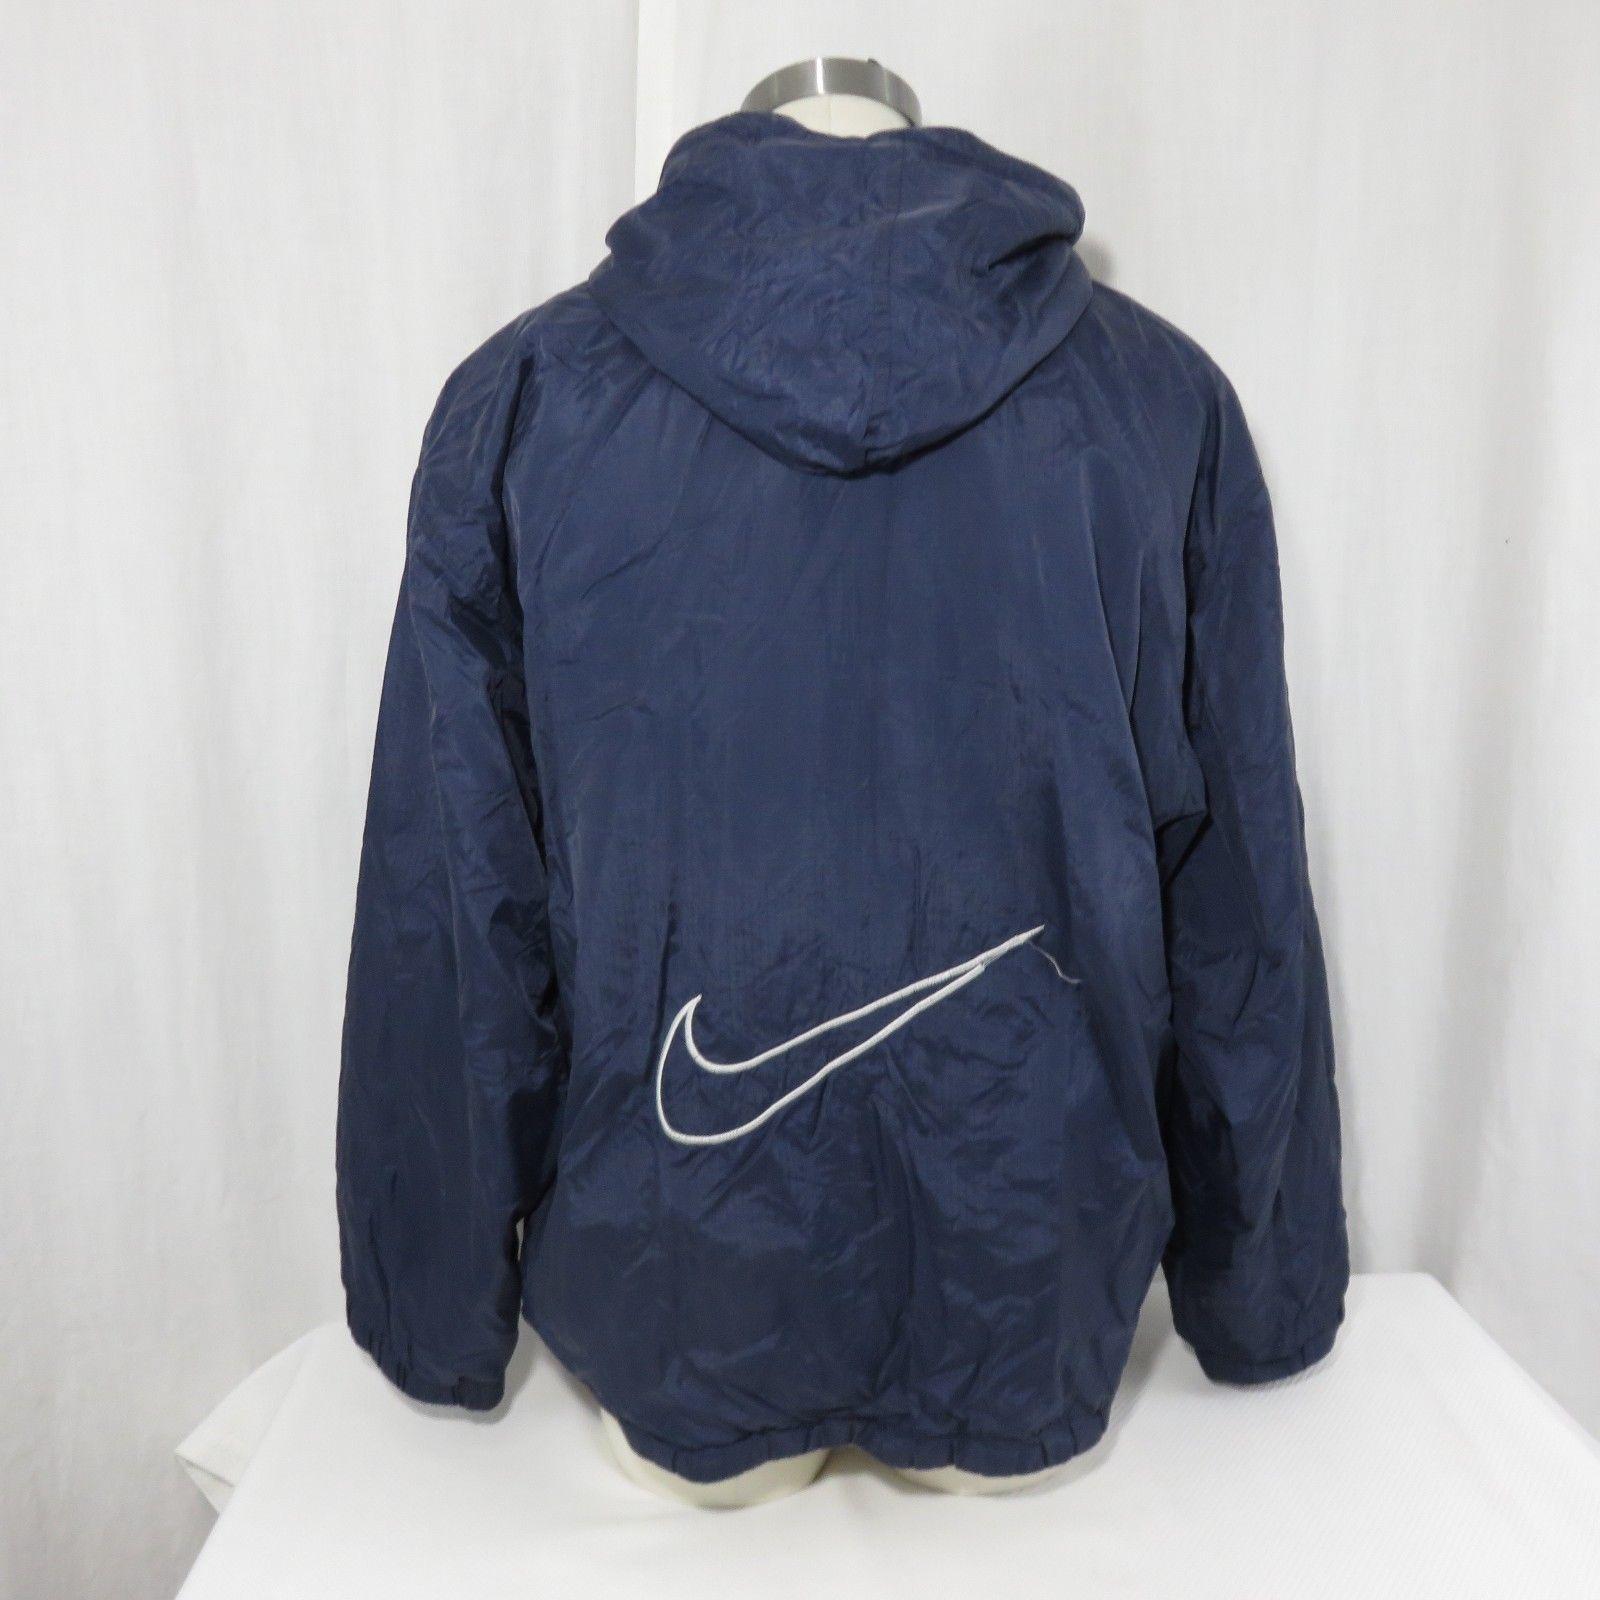 Vintage 90s Nike L Reversible Blue Gray Full Zip Hooded Fleece Nylon Big Swoosh